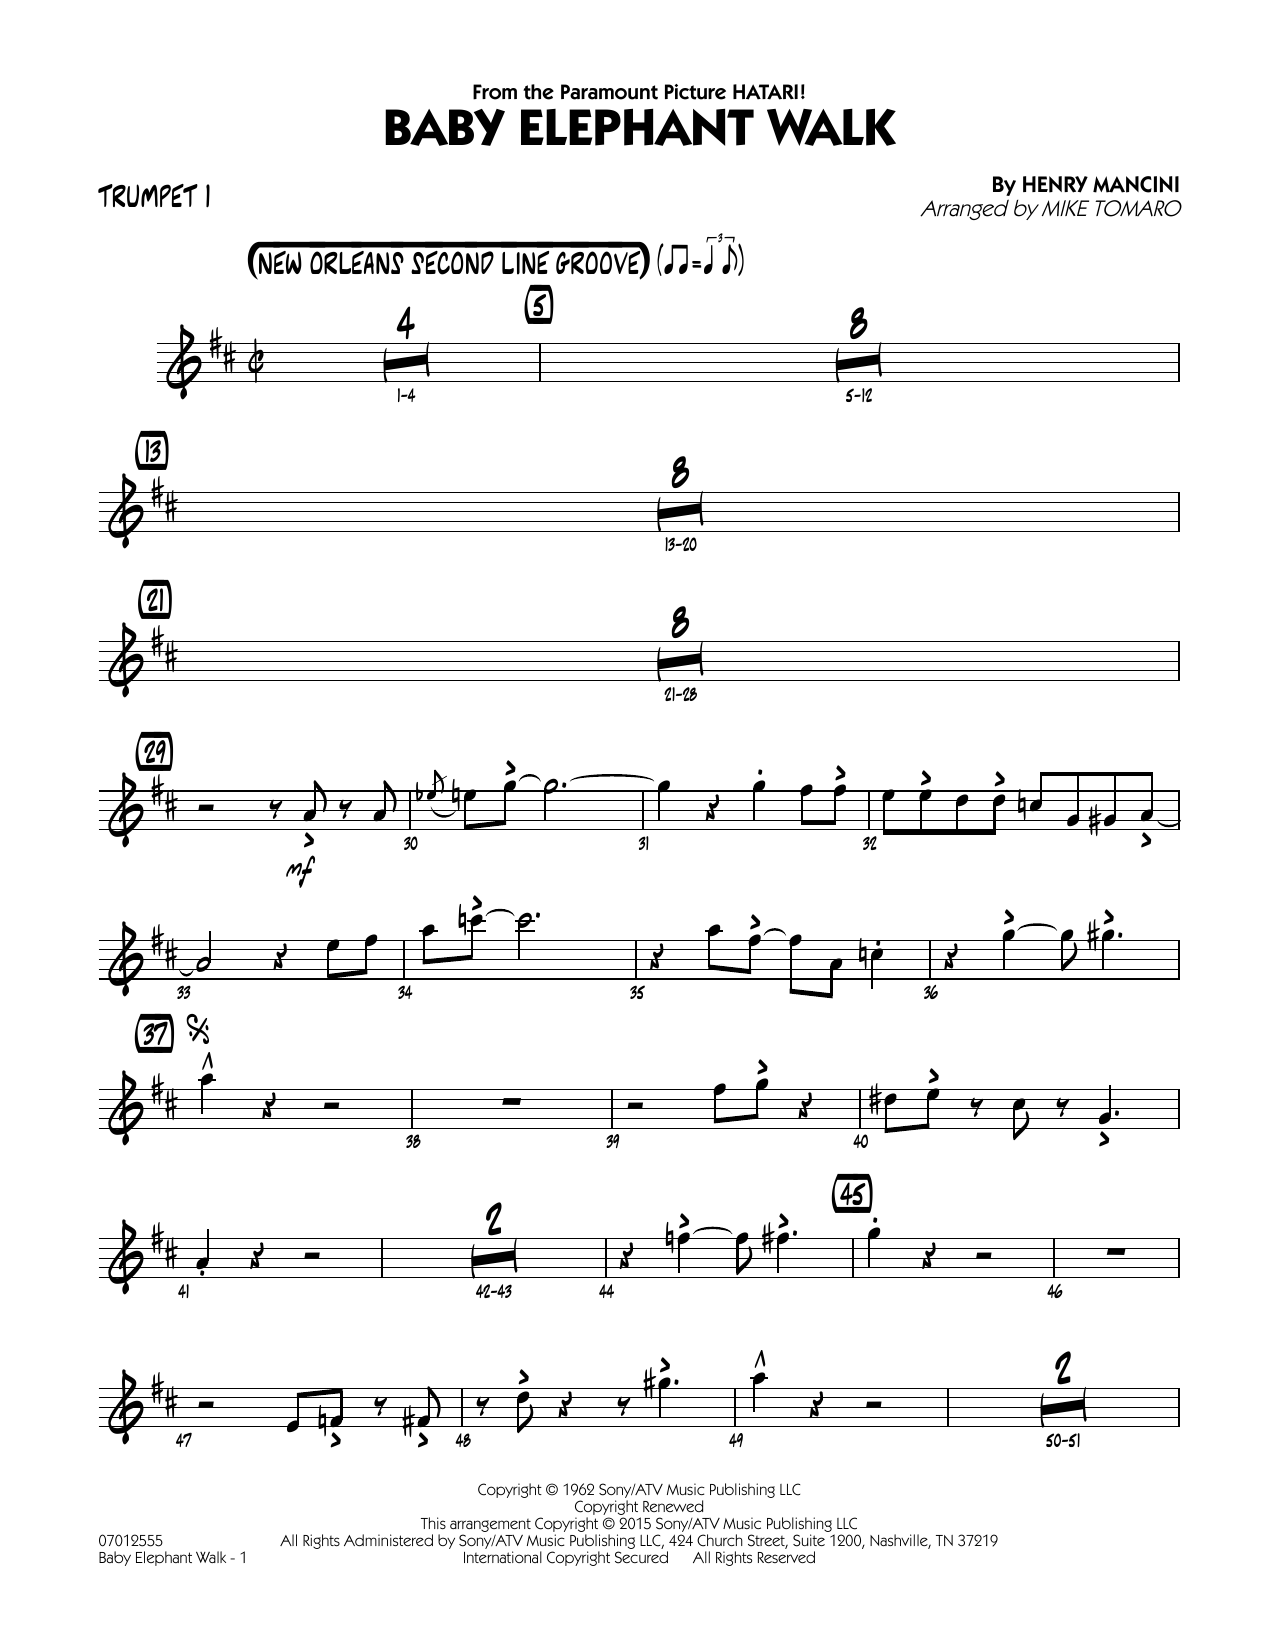 Baby Elephant Walk - Trumpet 1 Sheet Music